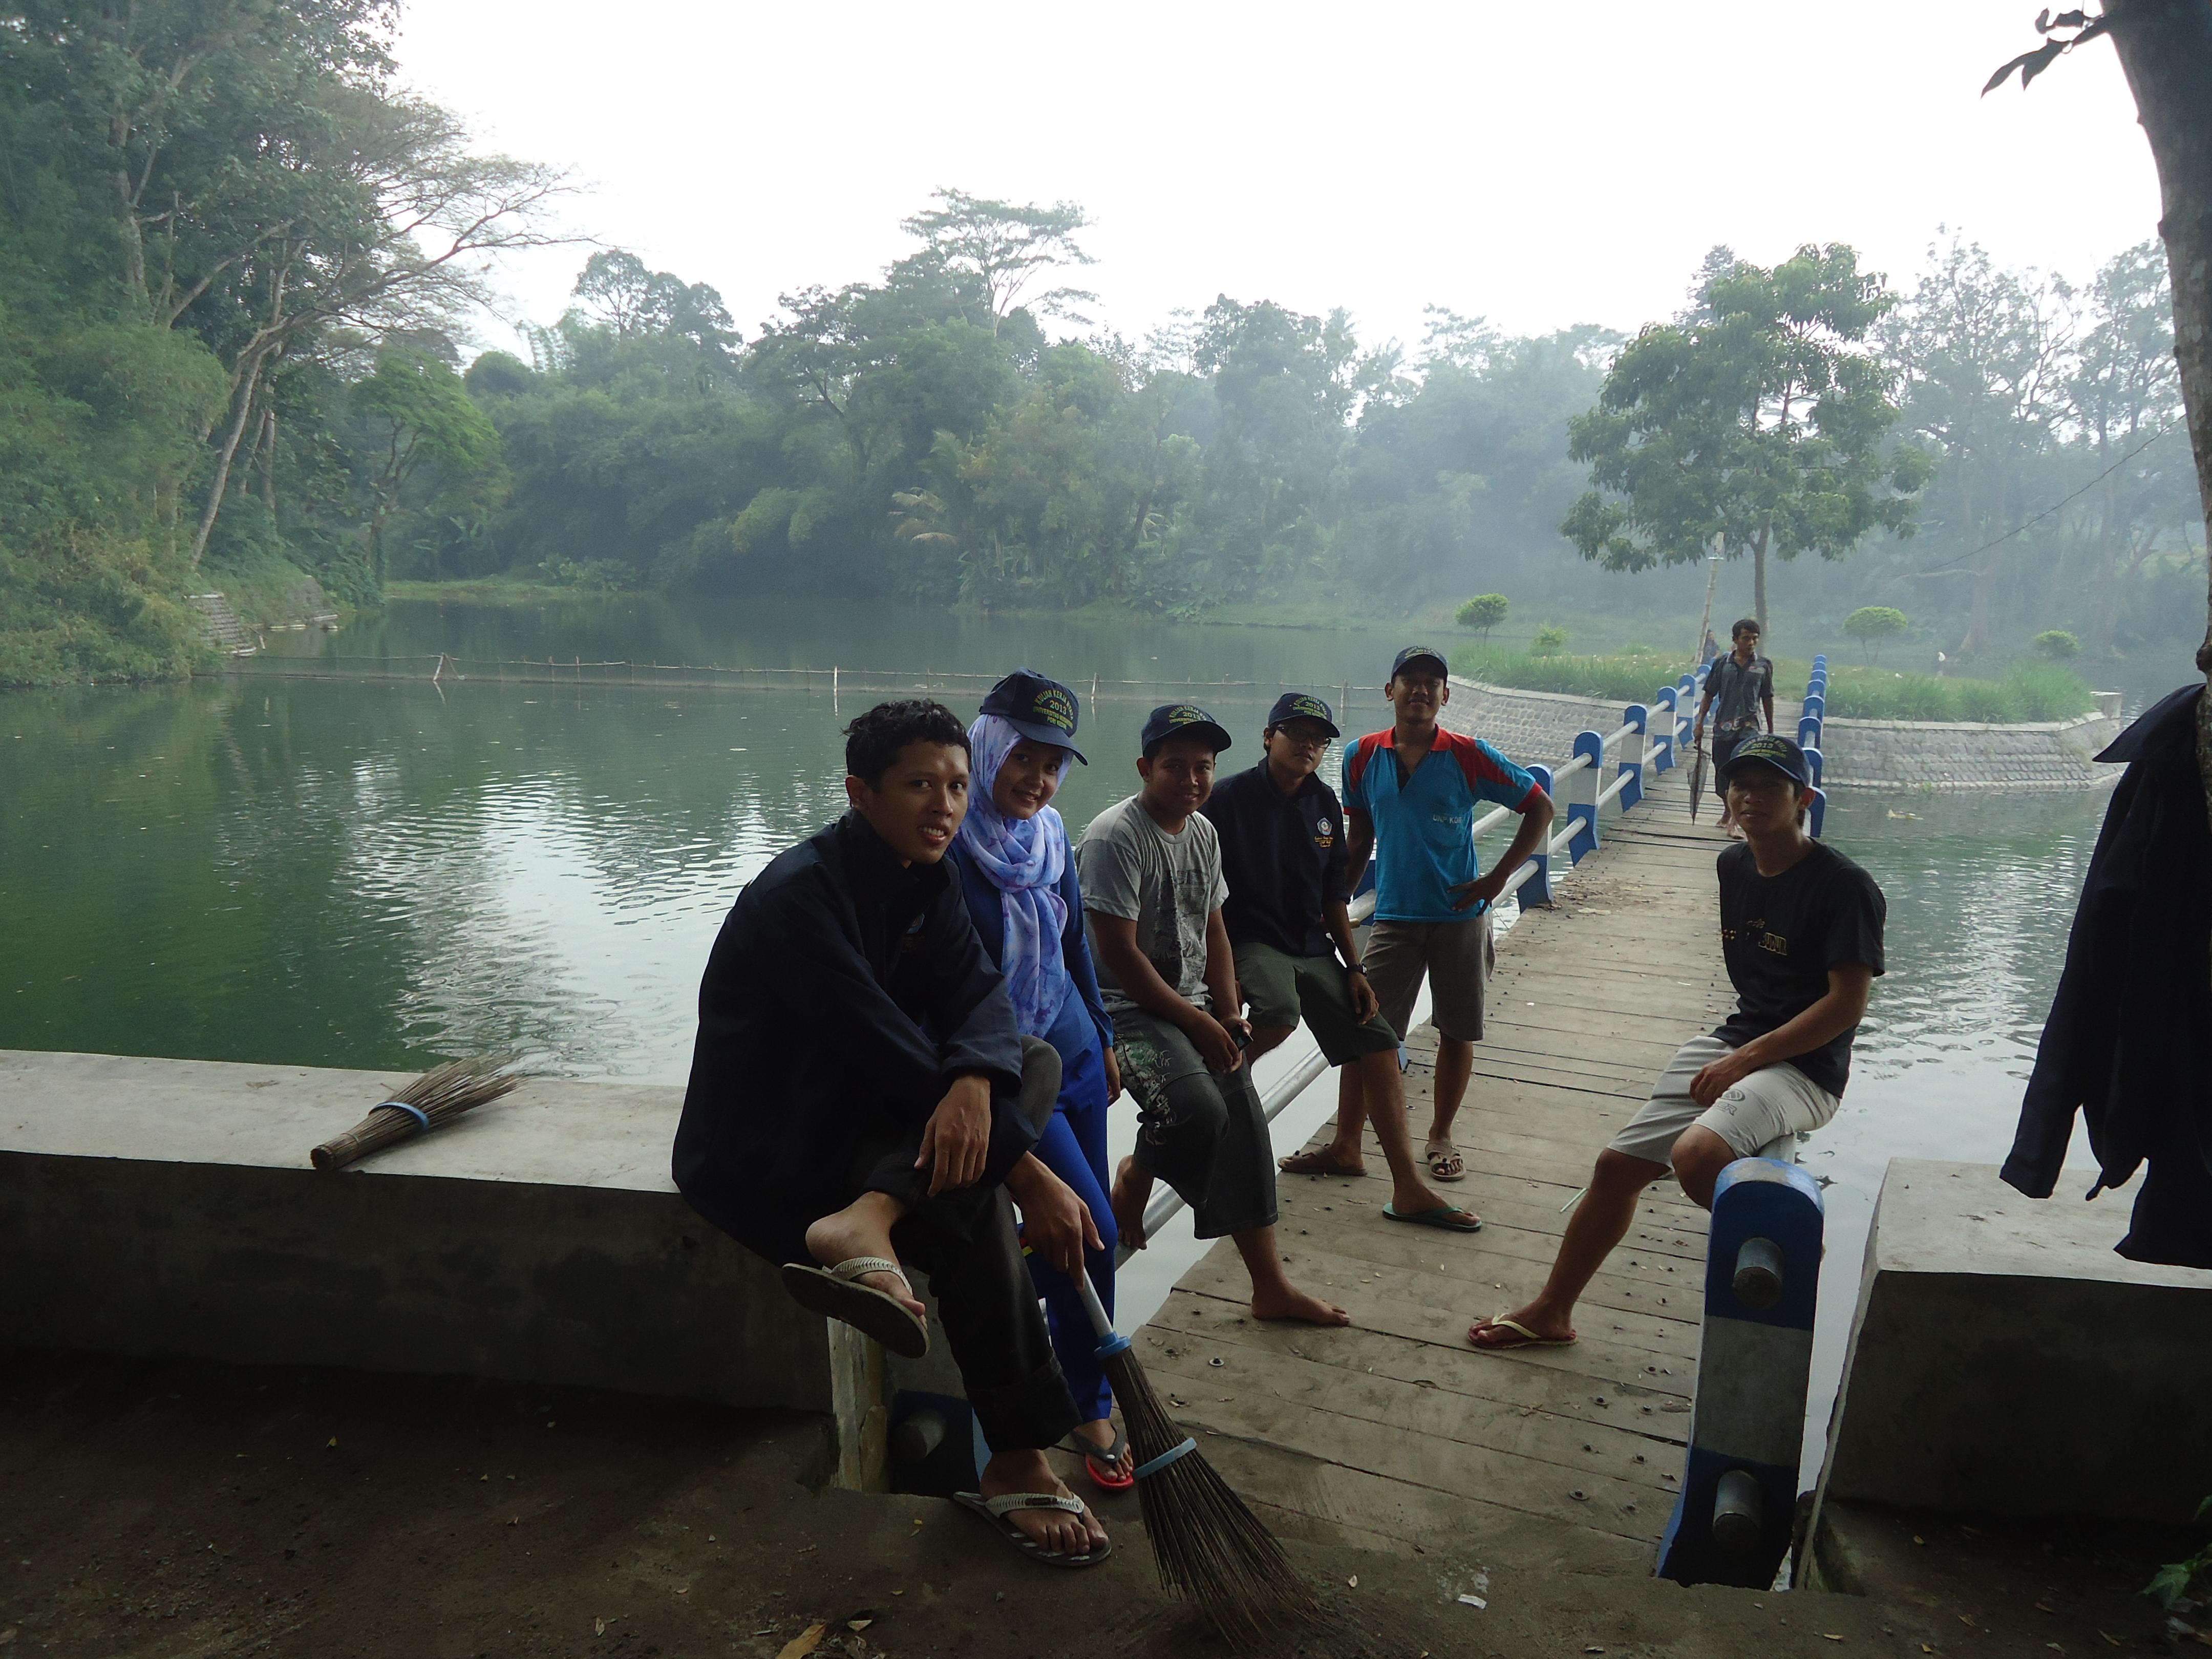 Sumber Comblang Wisata Desa Pranggang Onik Sam Dsc02237 Ubalan Kab